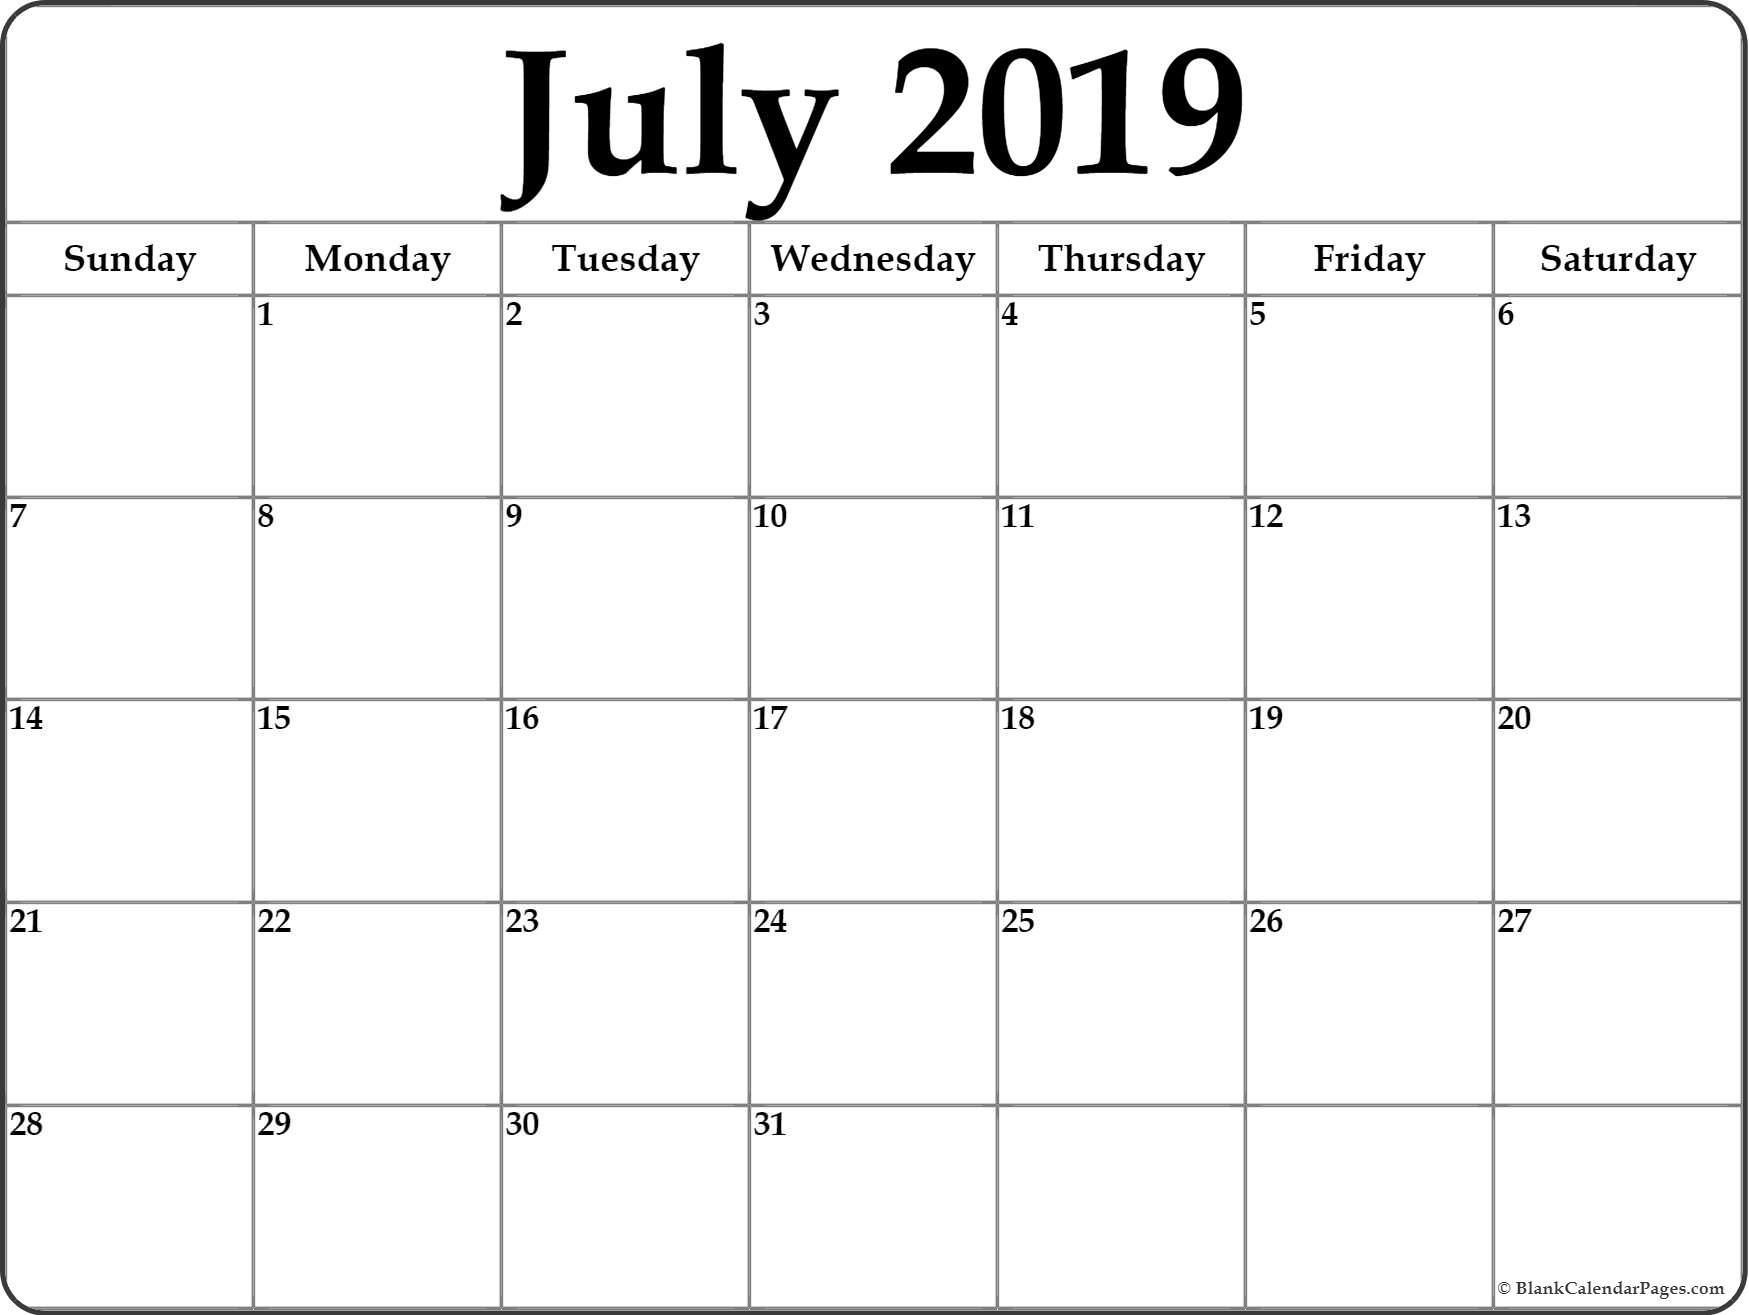 July 2019 Blank Calendar Templates Printable Calendars July